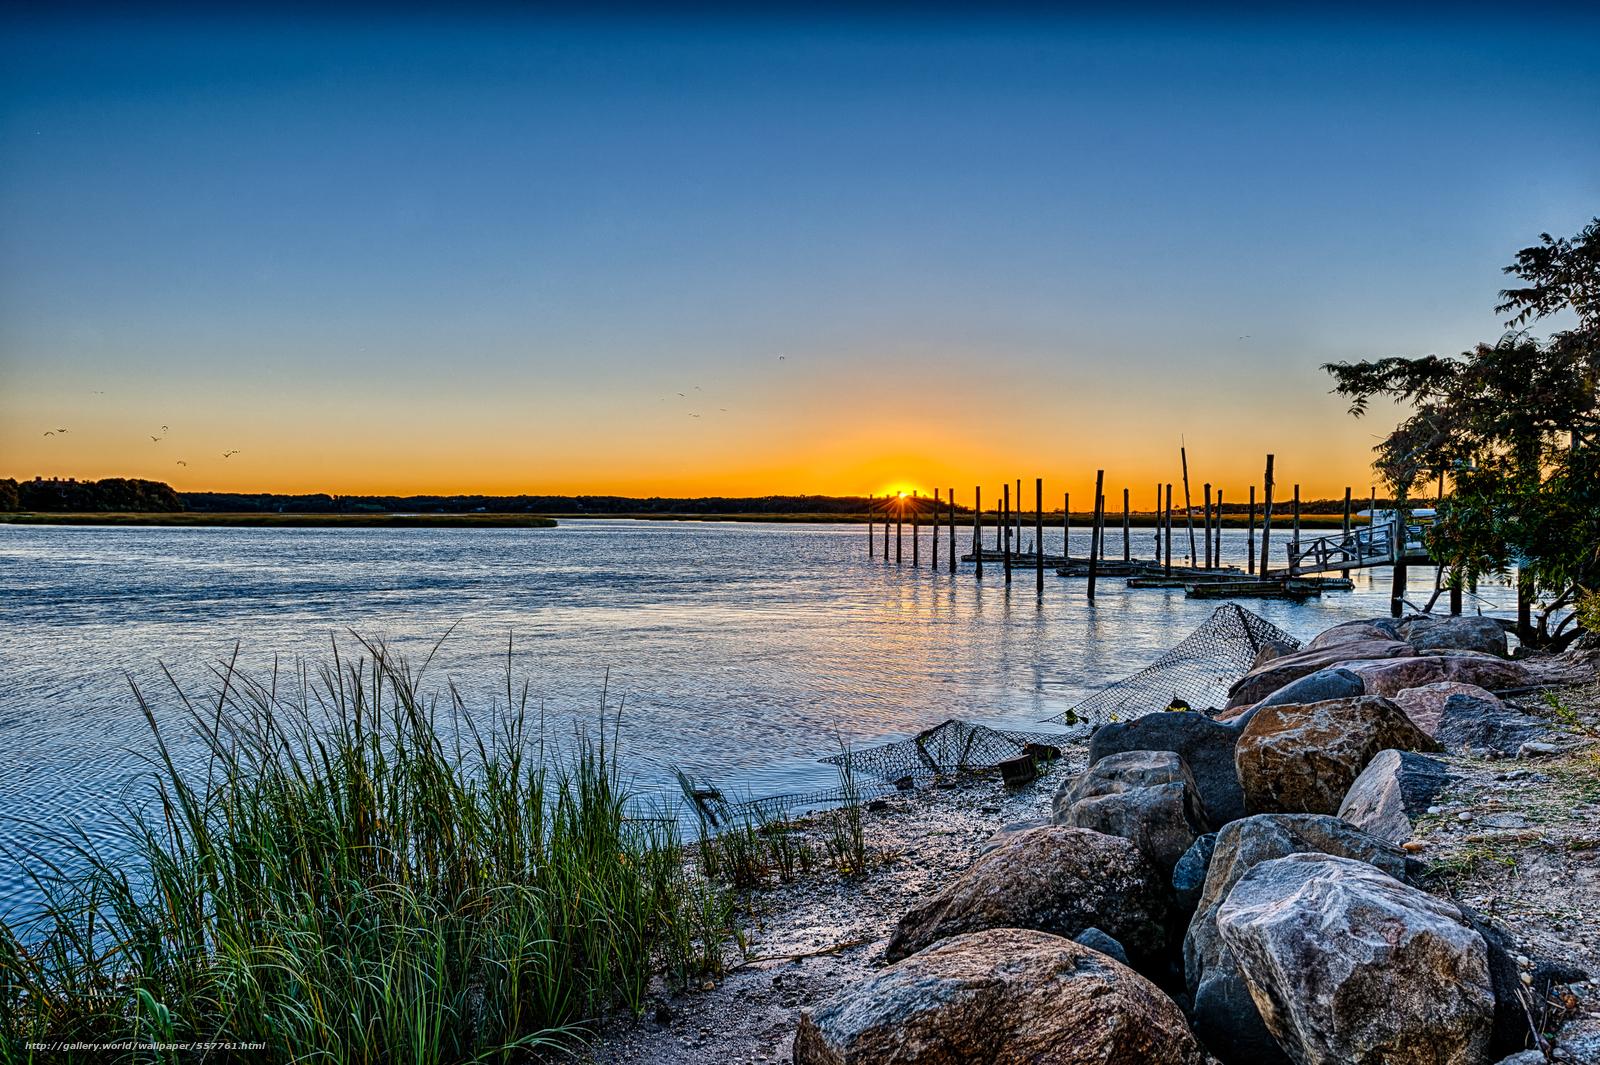 Download wallpaper Stony Brook Harbor   Long Island New York 1600x1065